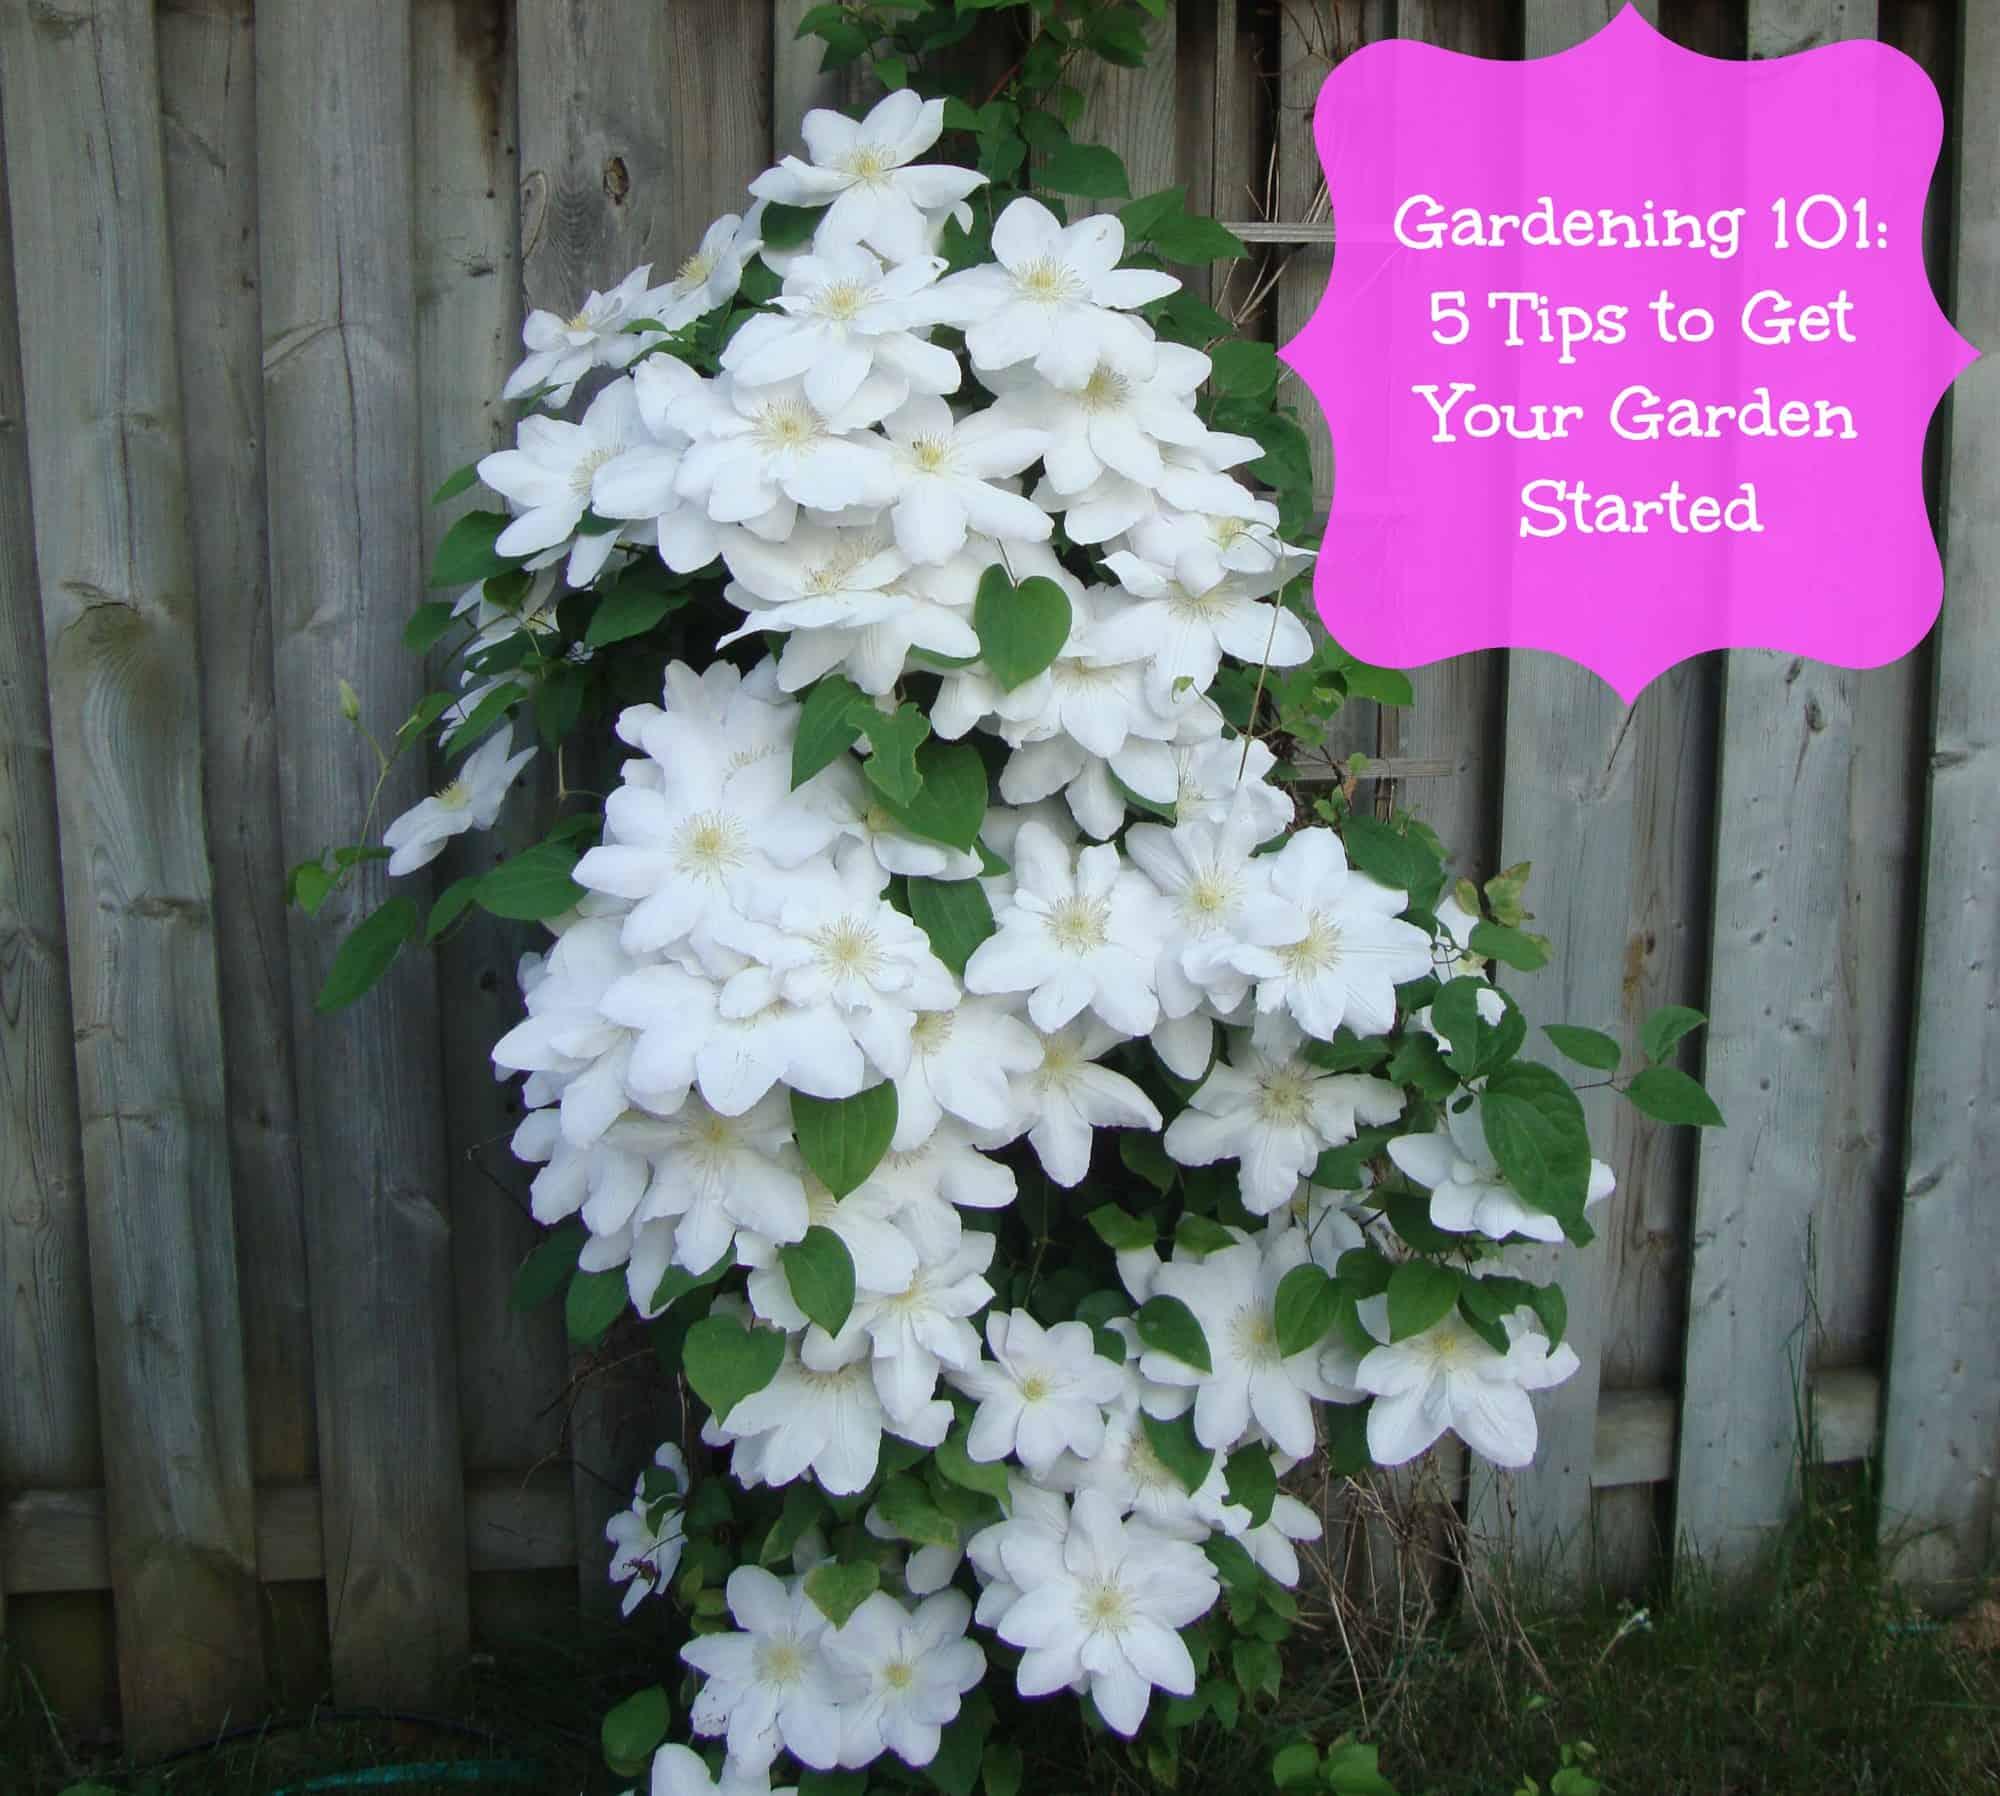 Gardening 101 tips